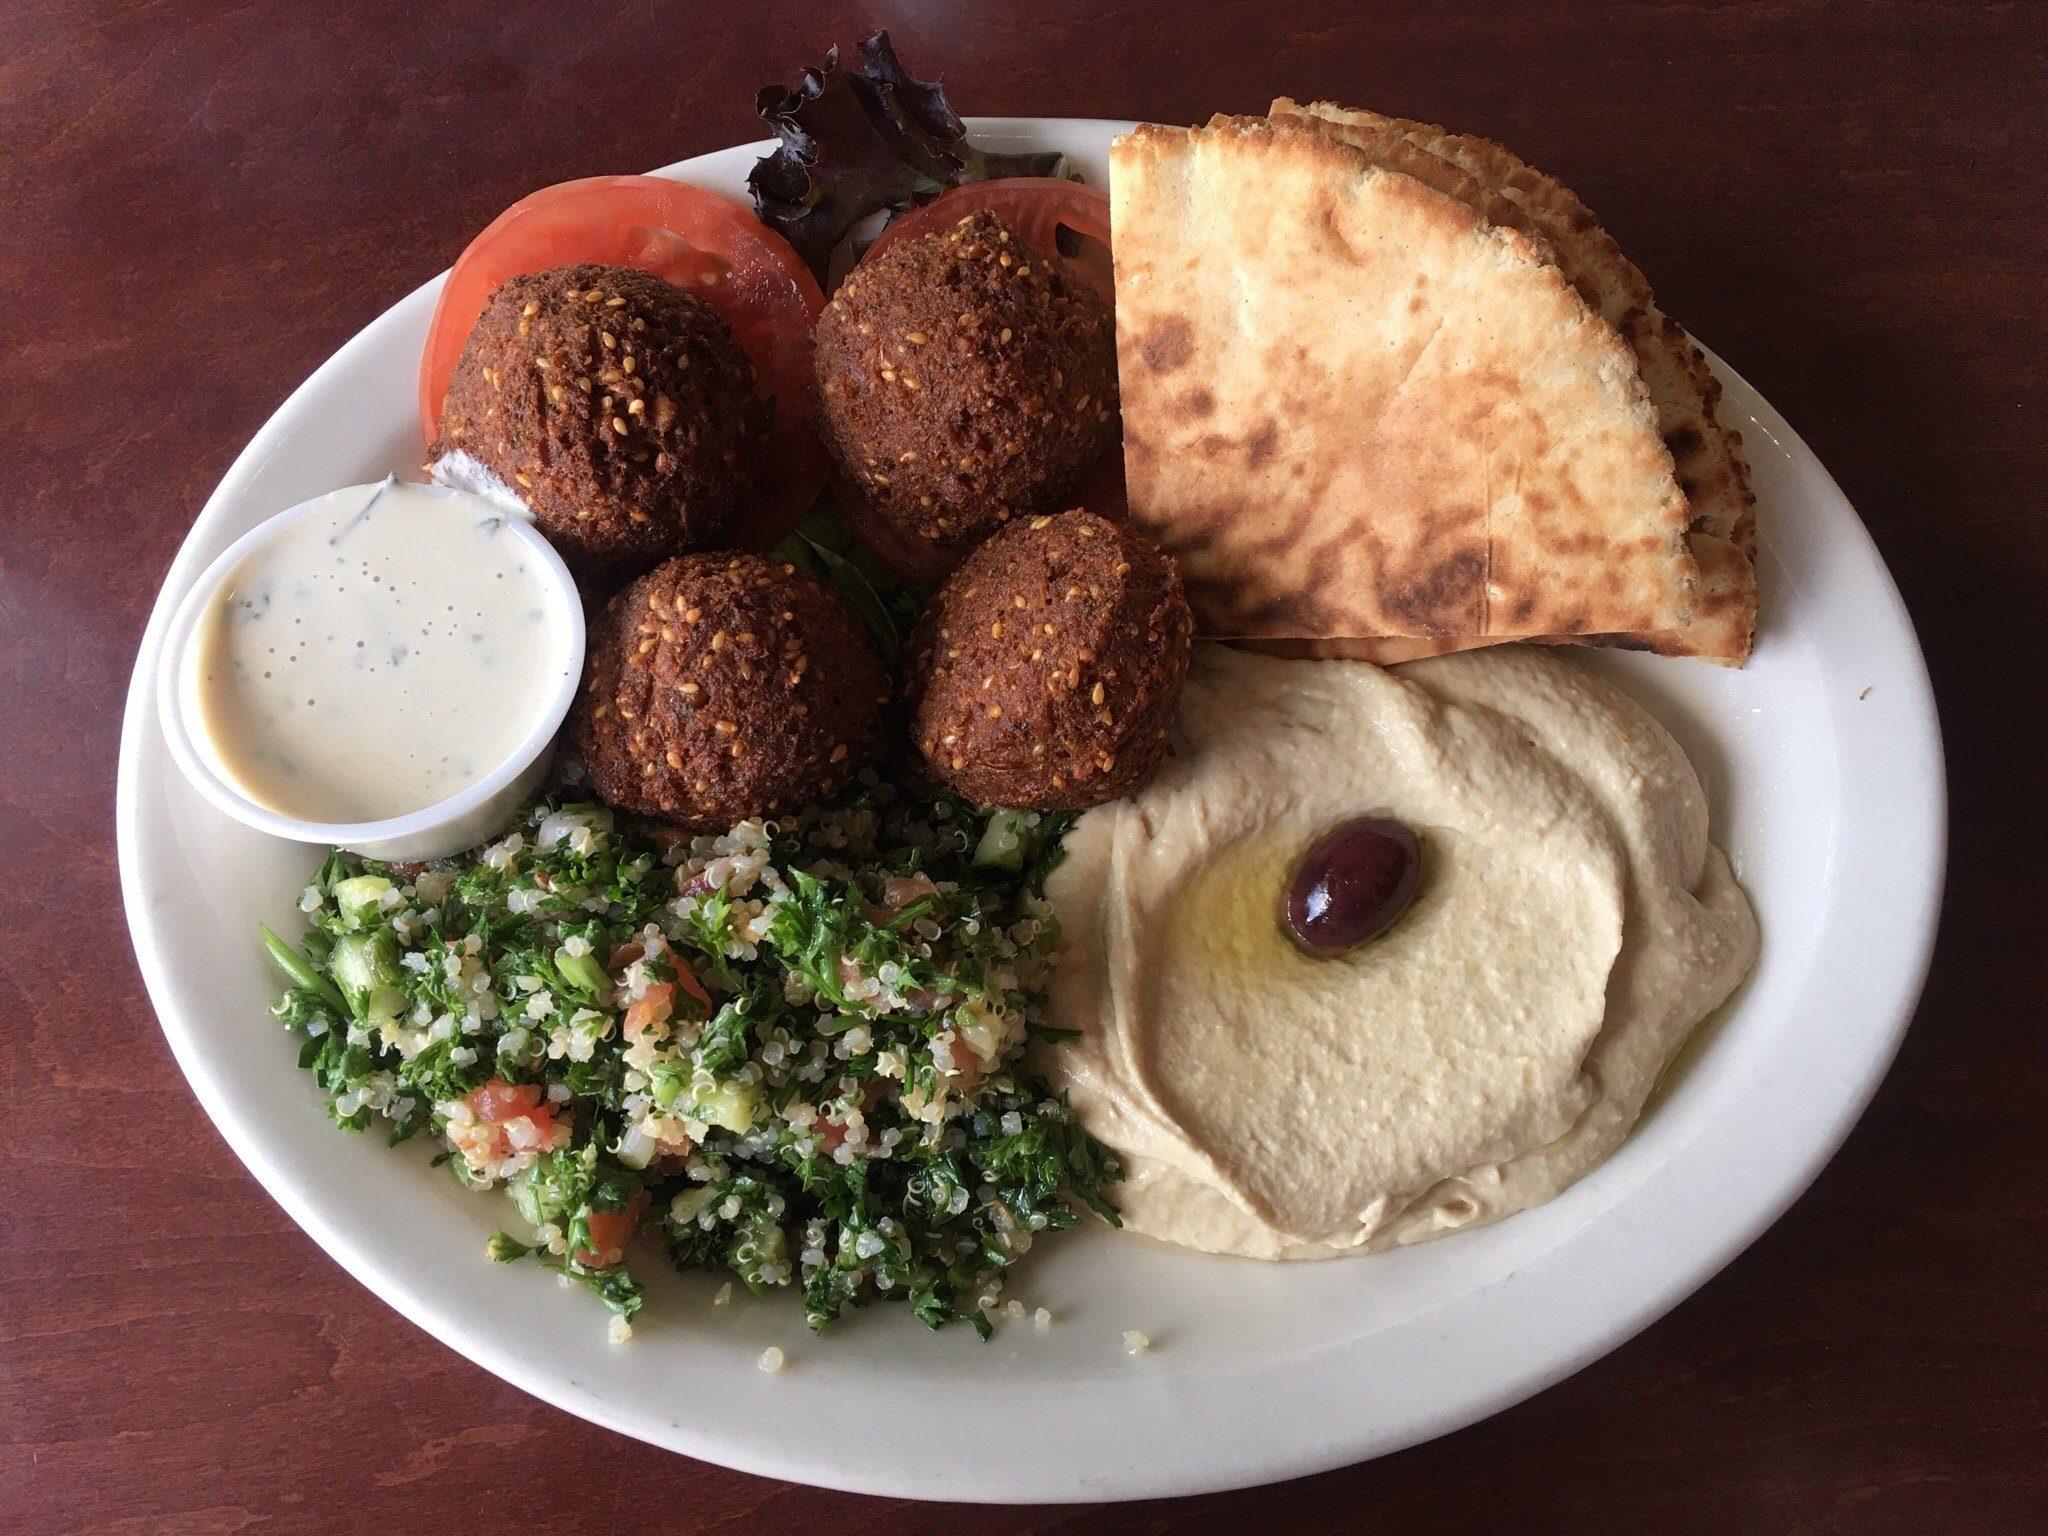 Mediterranean Deli, Bakery & Catering, Chapel Hill